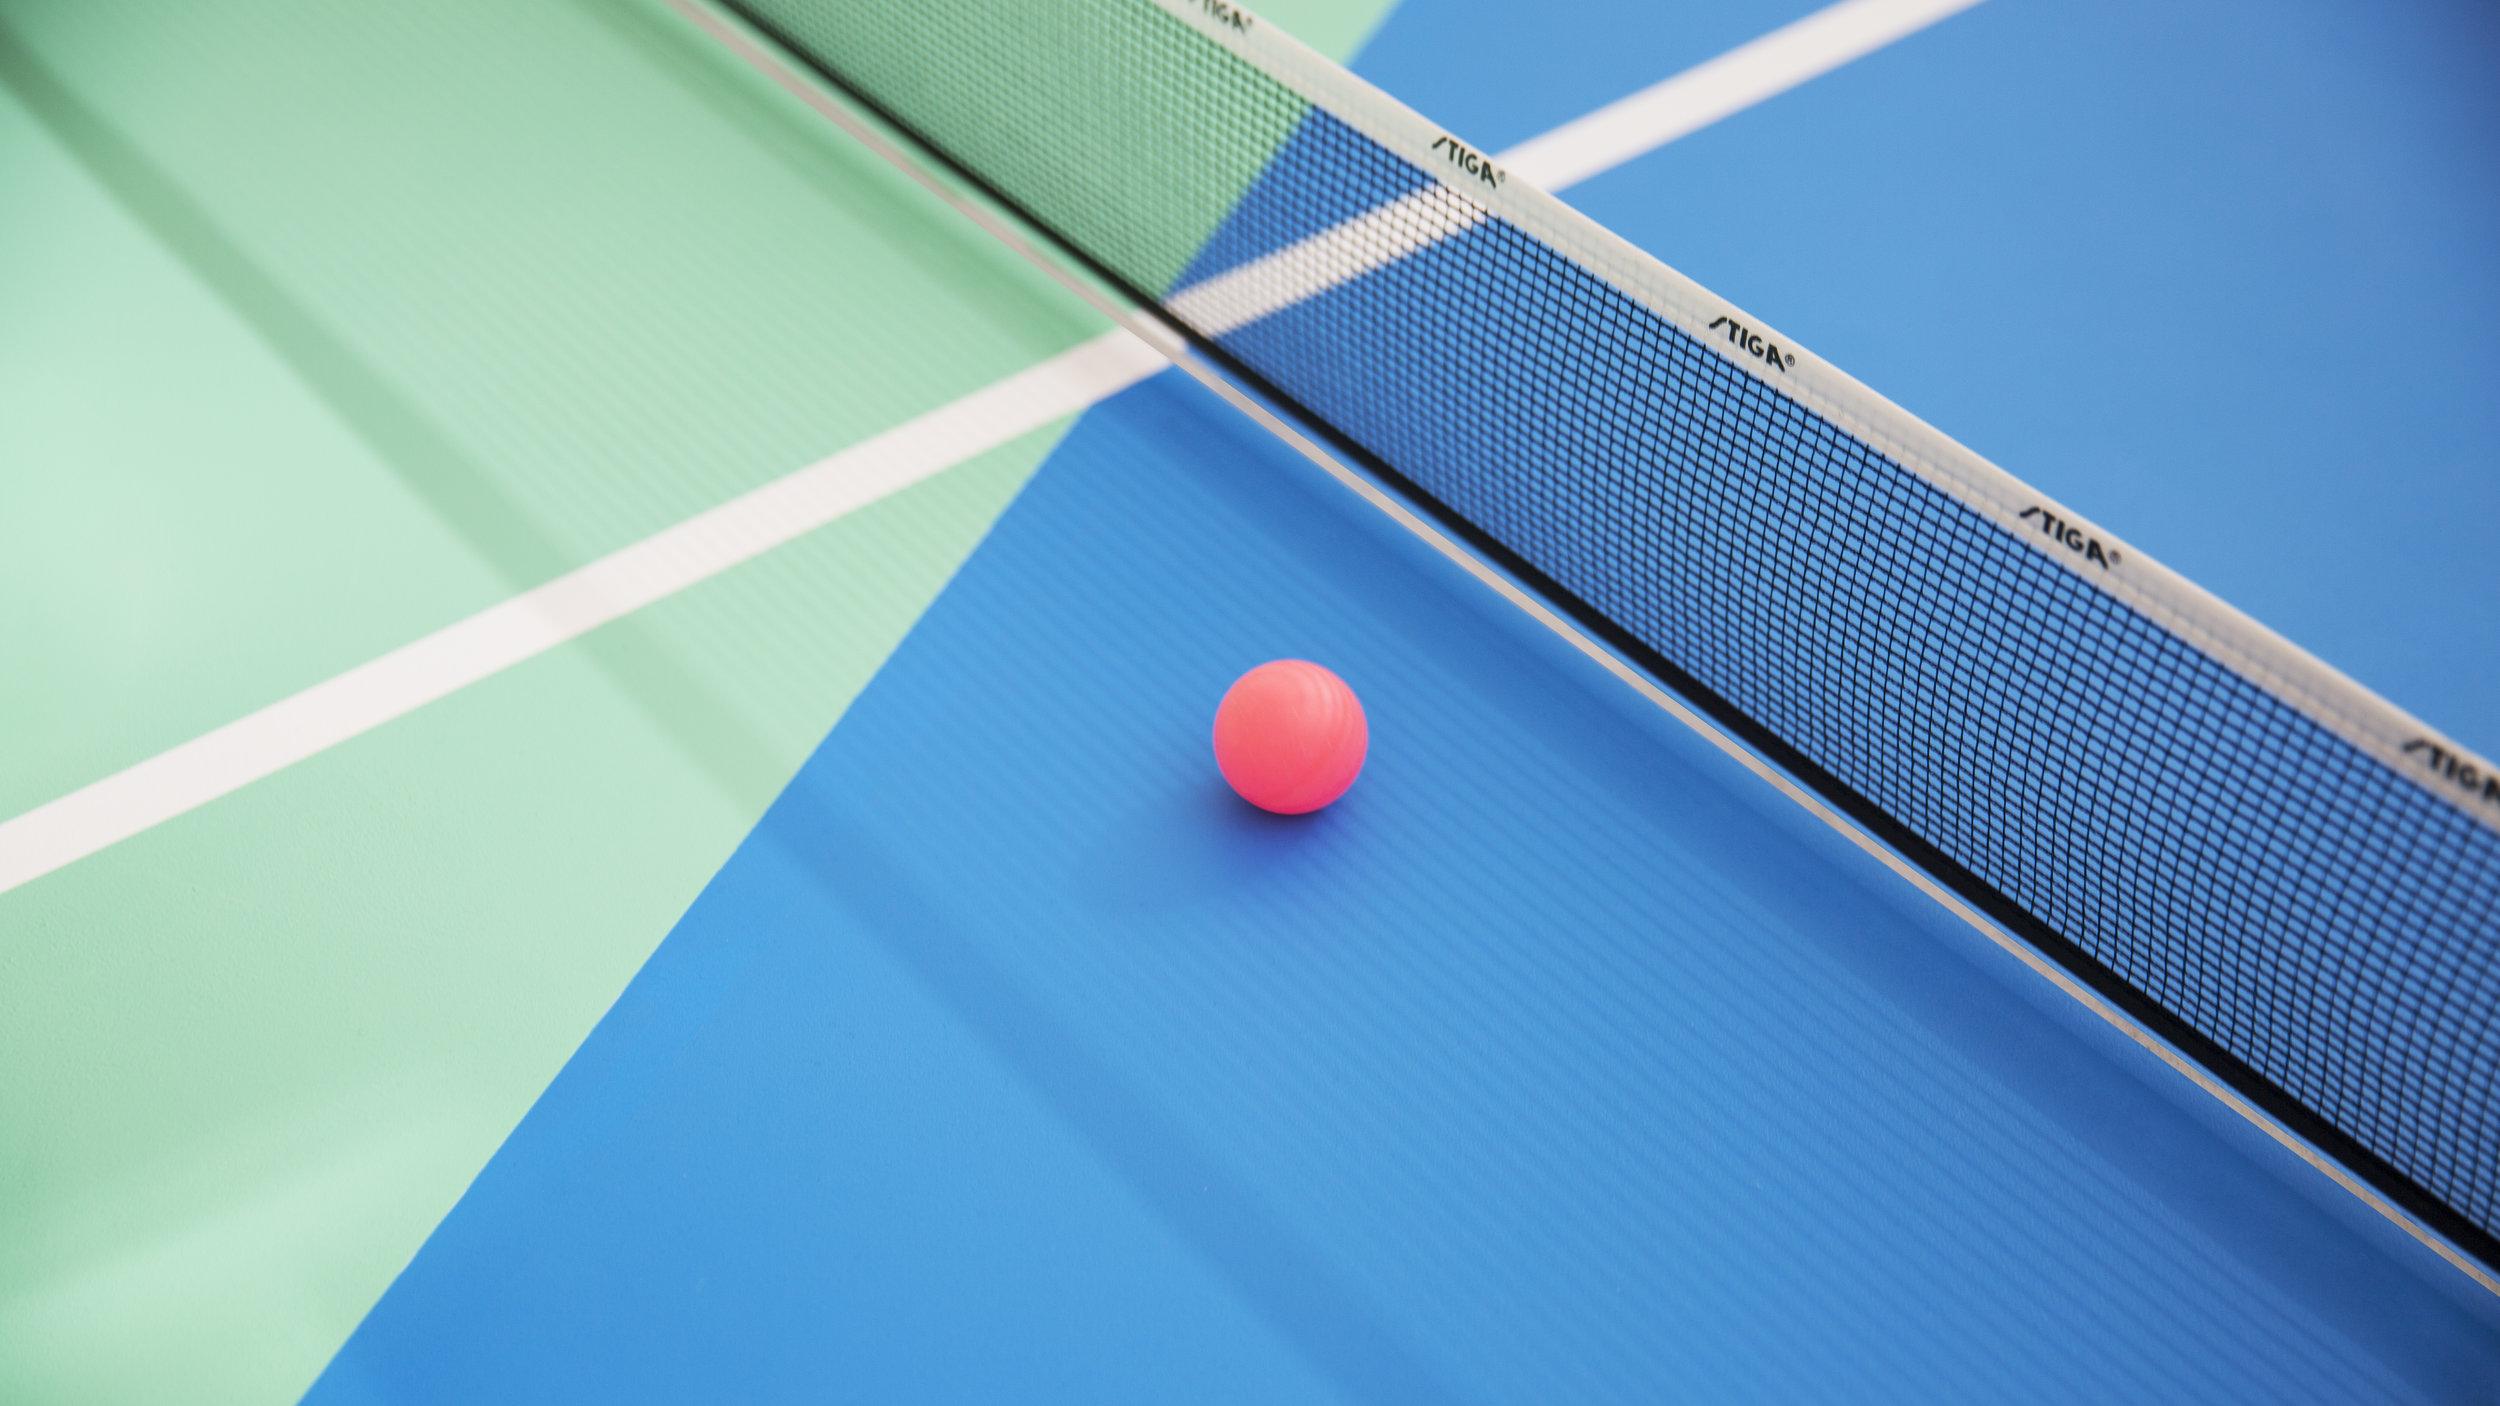 ping-pong-fm-06.jpg